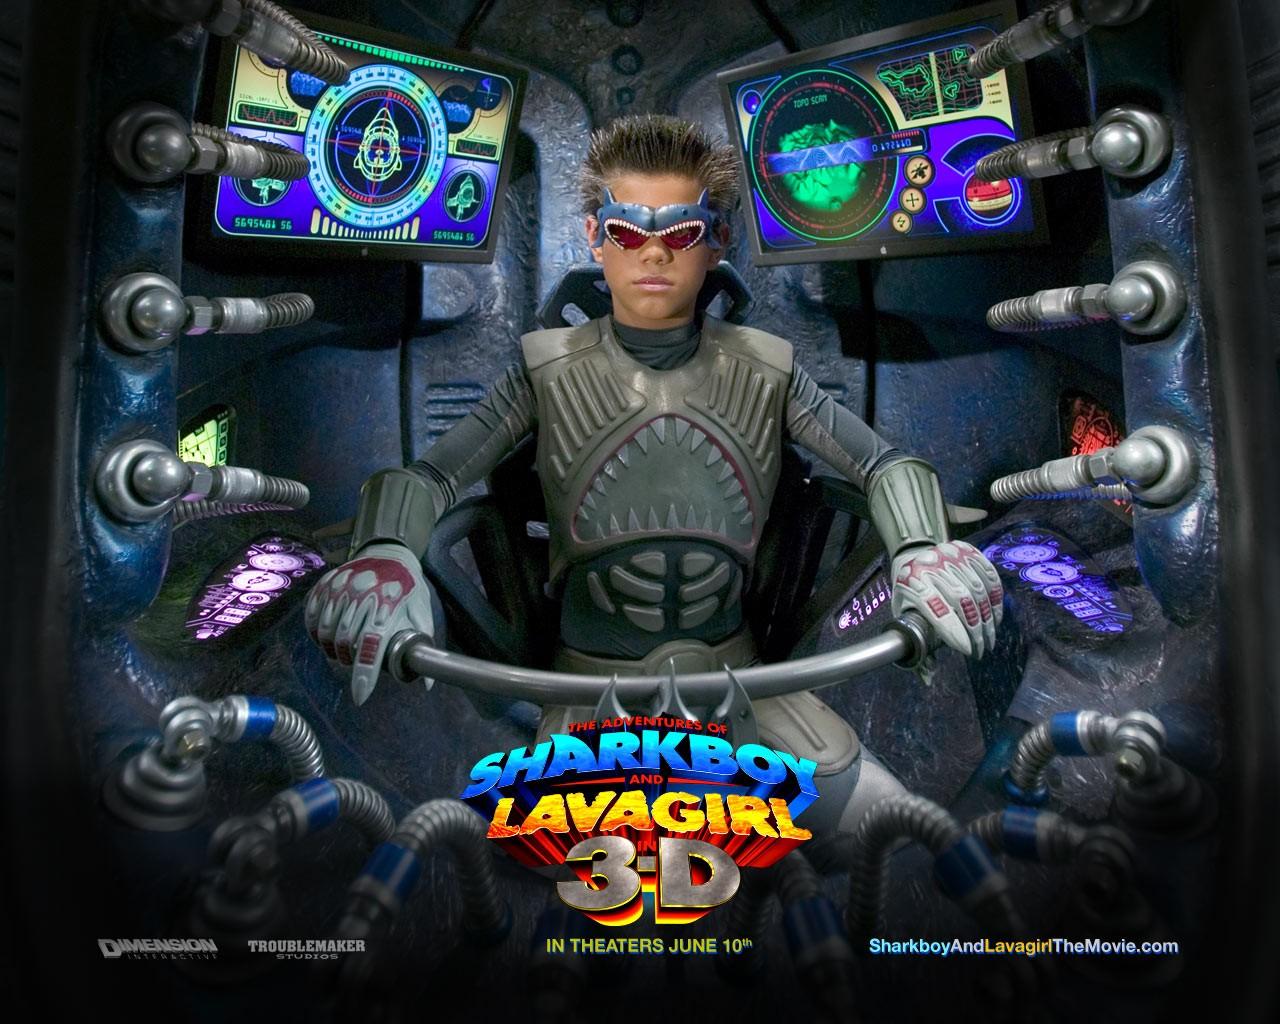 Un wallpaper del film The Adventures of Shark Boy & Lava Girl in 3-D, con Taylor Lautner